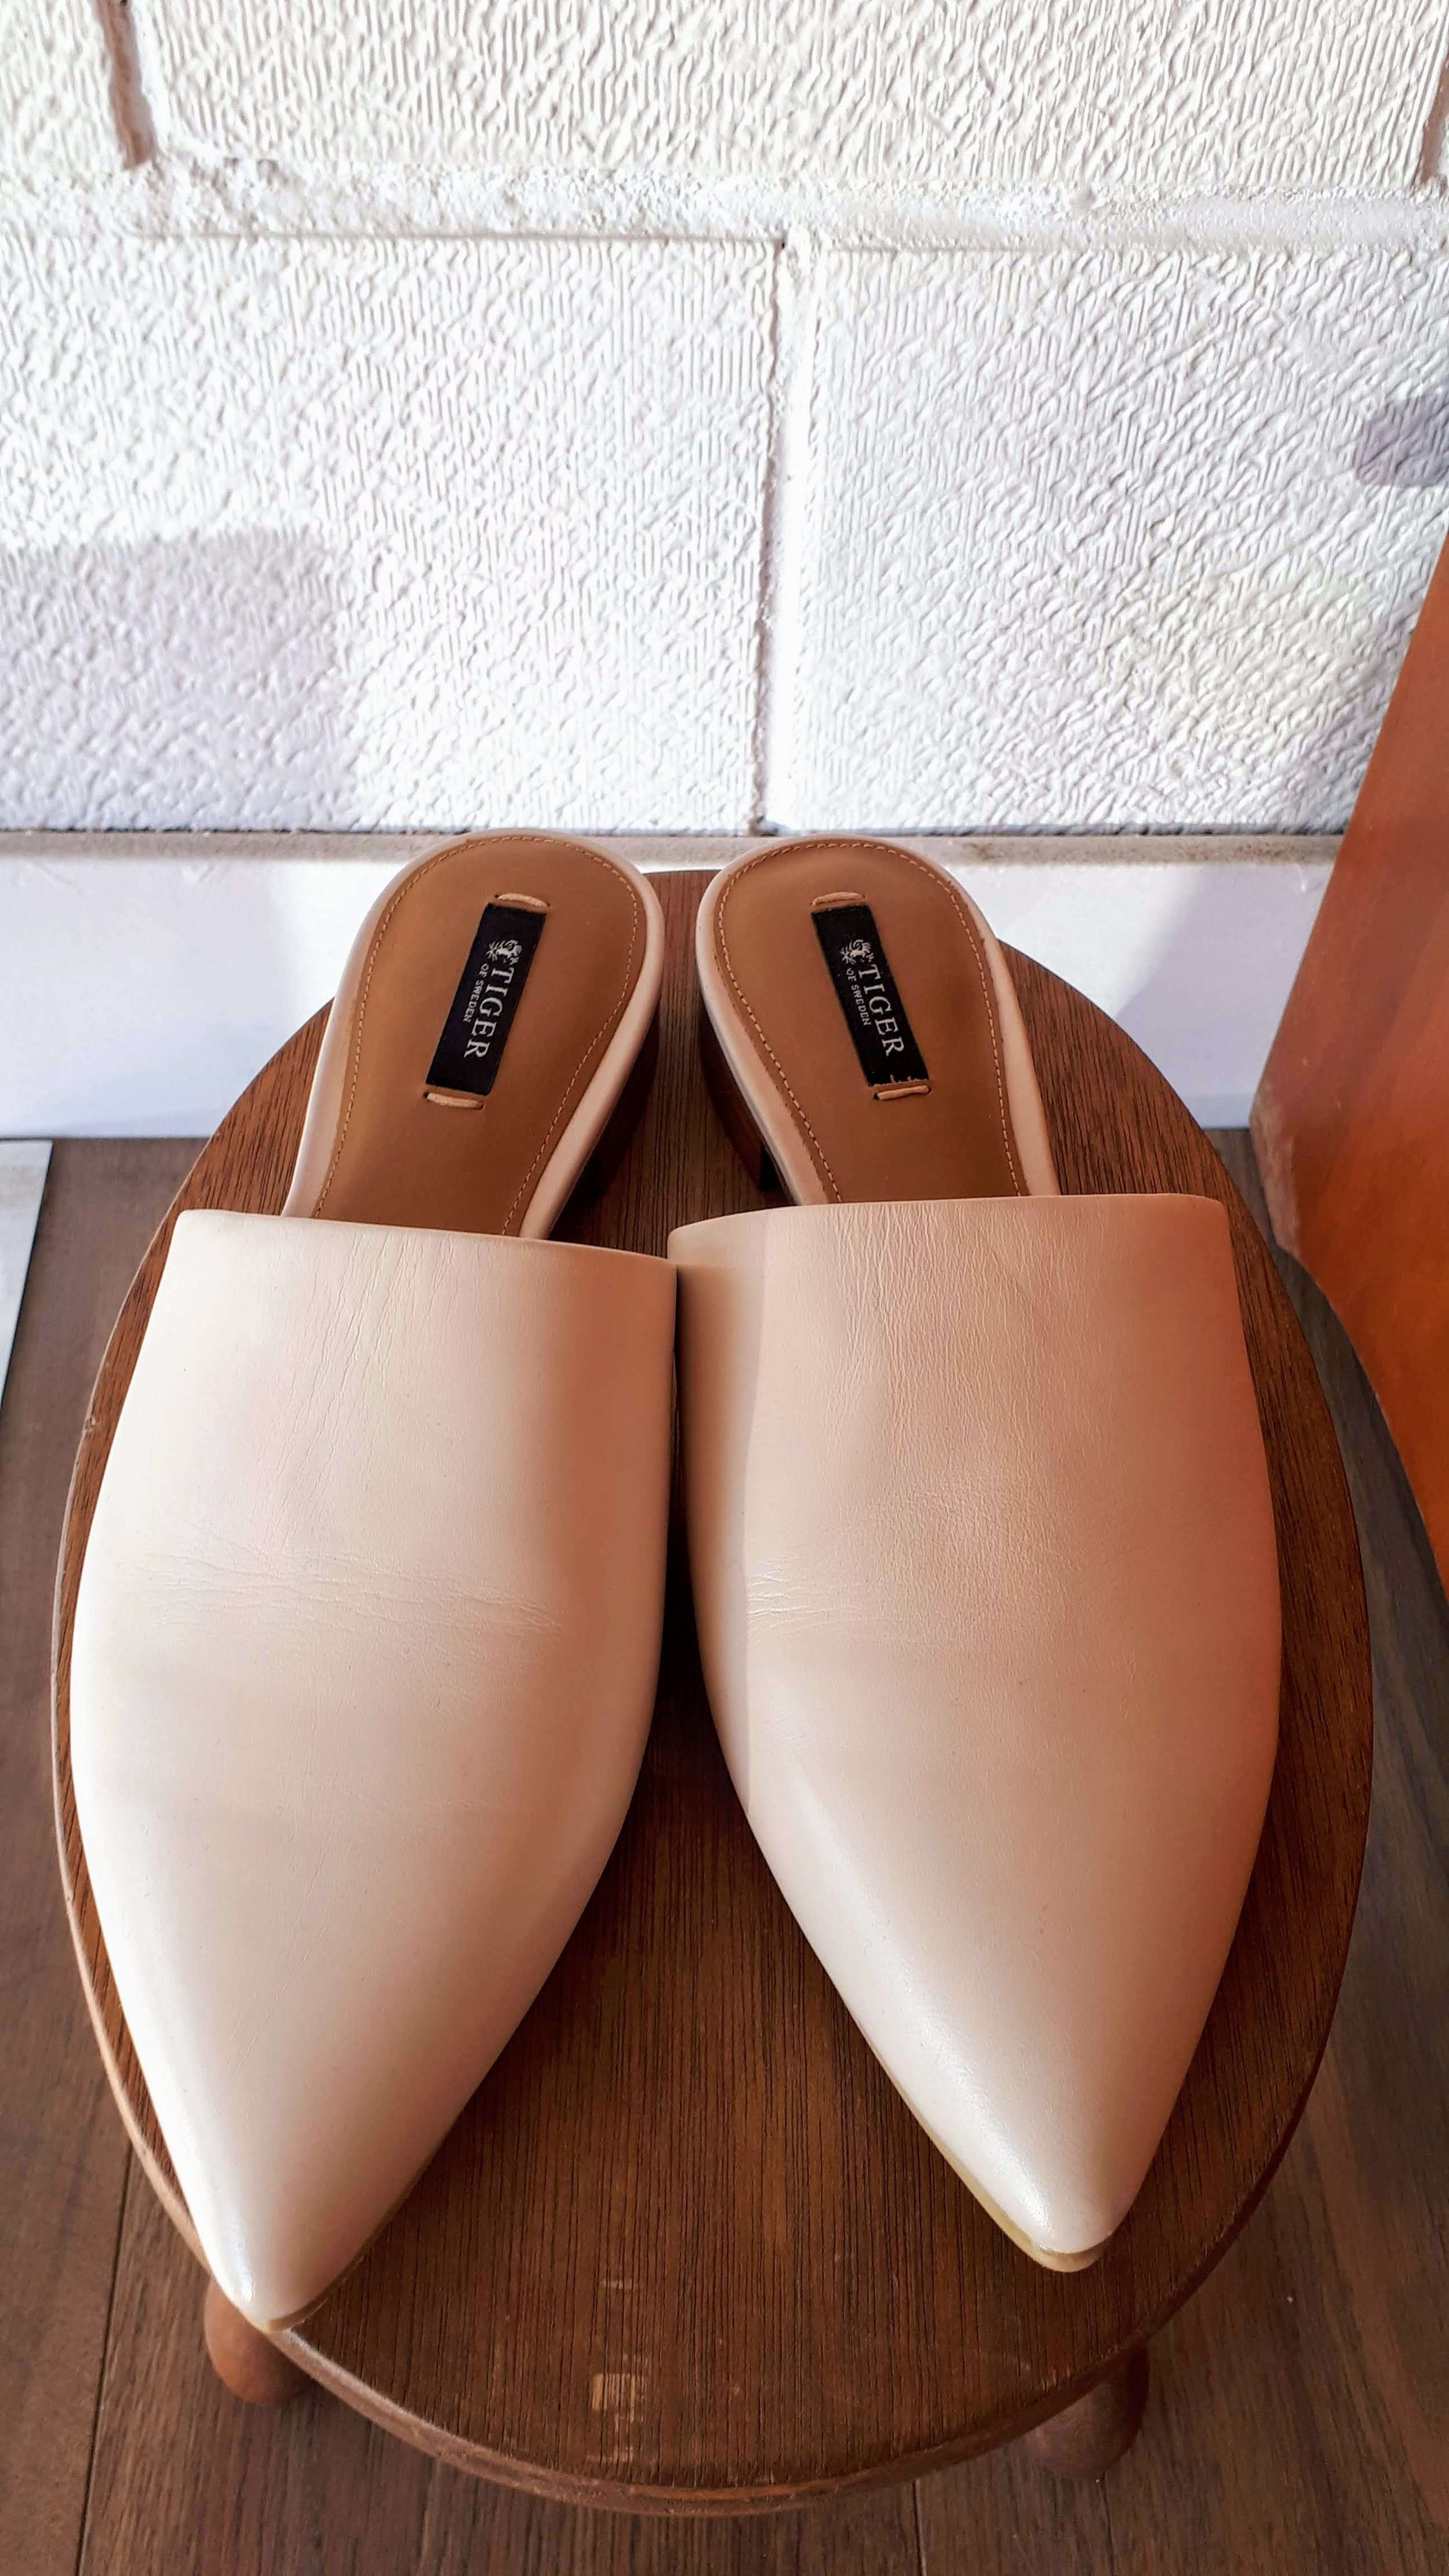 Tiger of Sweden shoes; Size 9, $48